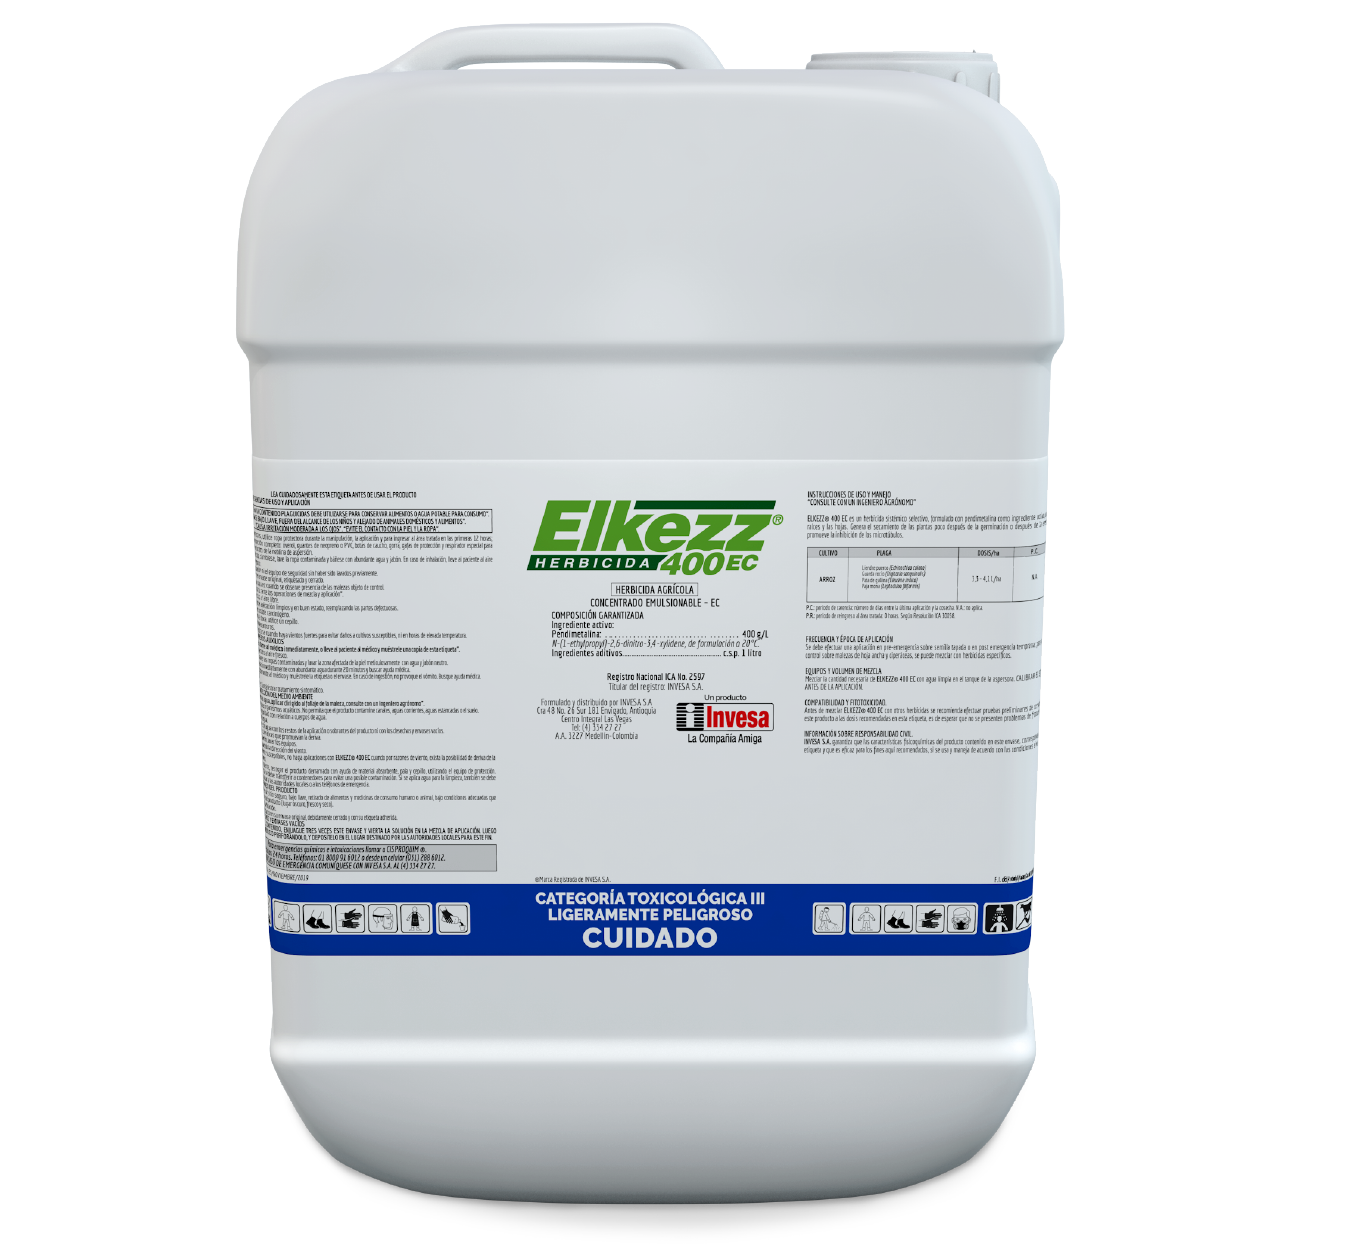 Herbicida elkezz 400 ec invesa 20 litros